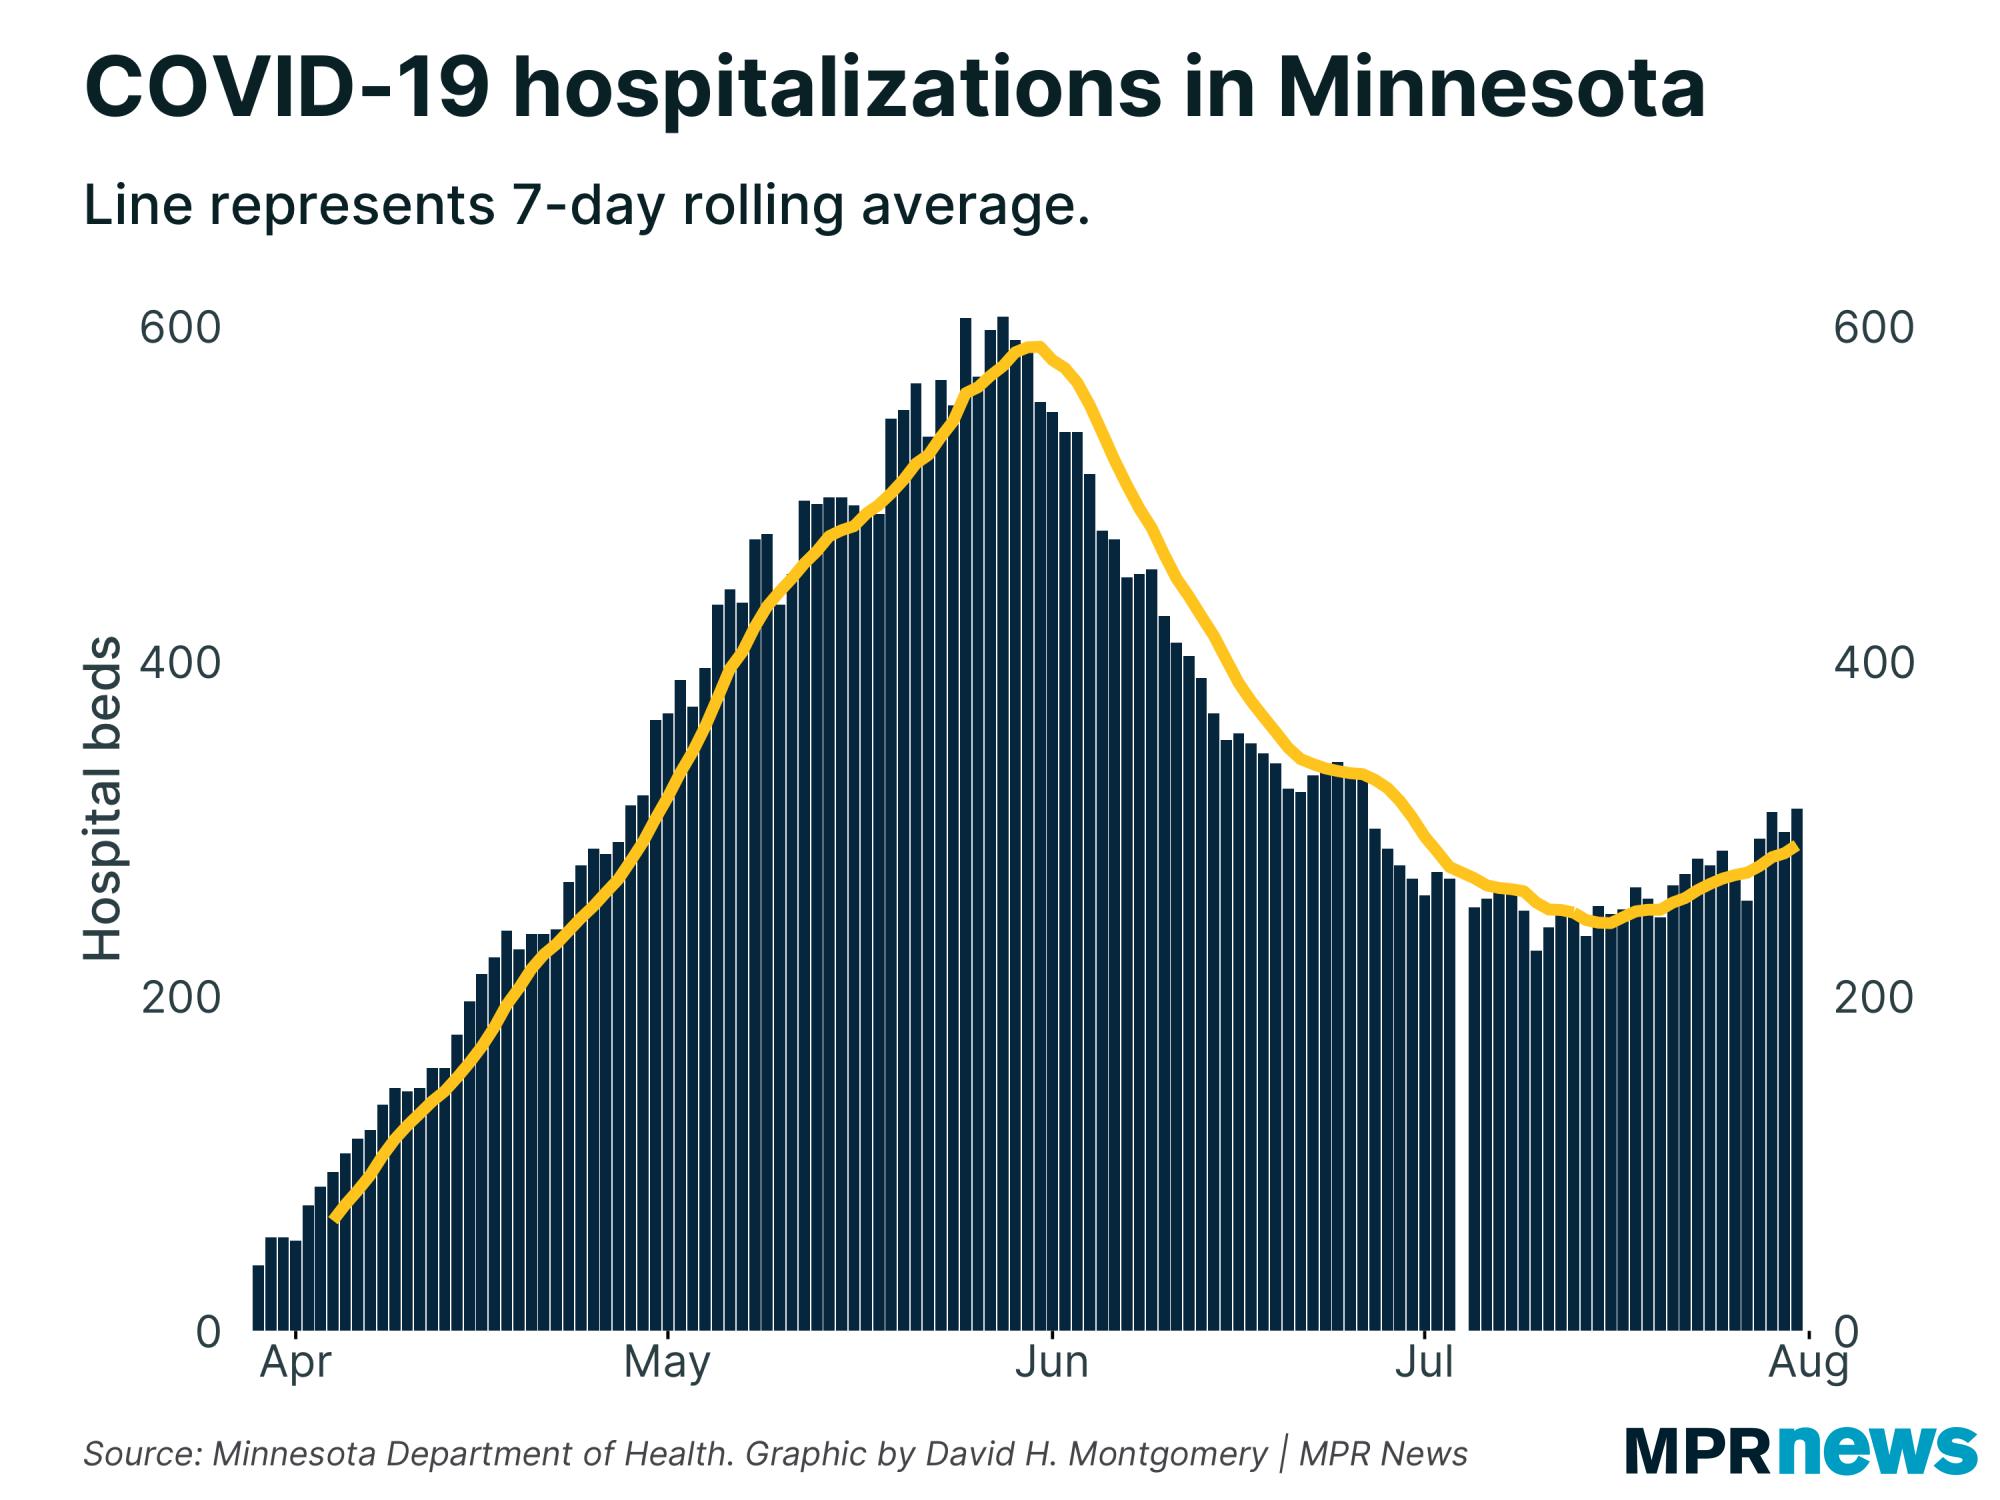 Current COVID-19 hospitalizations in Minnesota